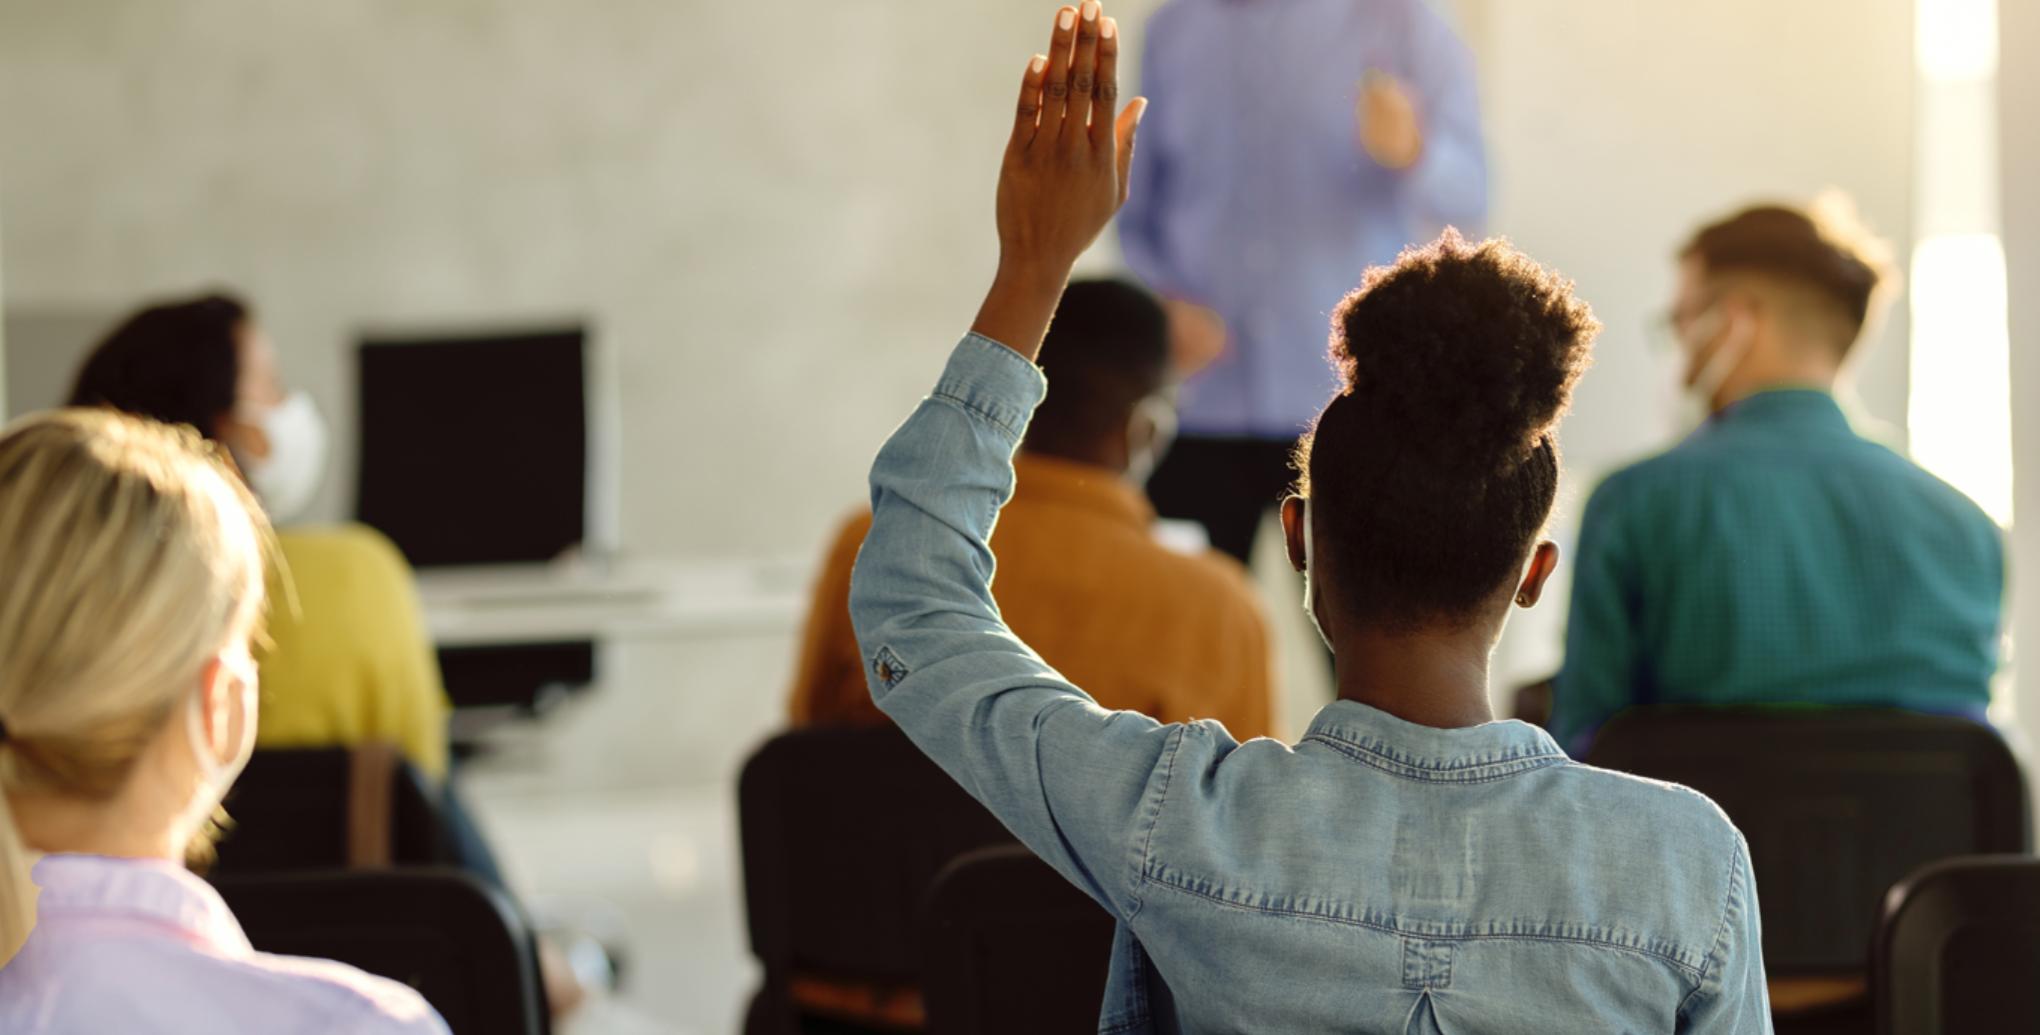 Person raising hand in classroom.